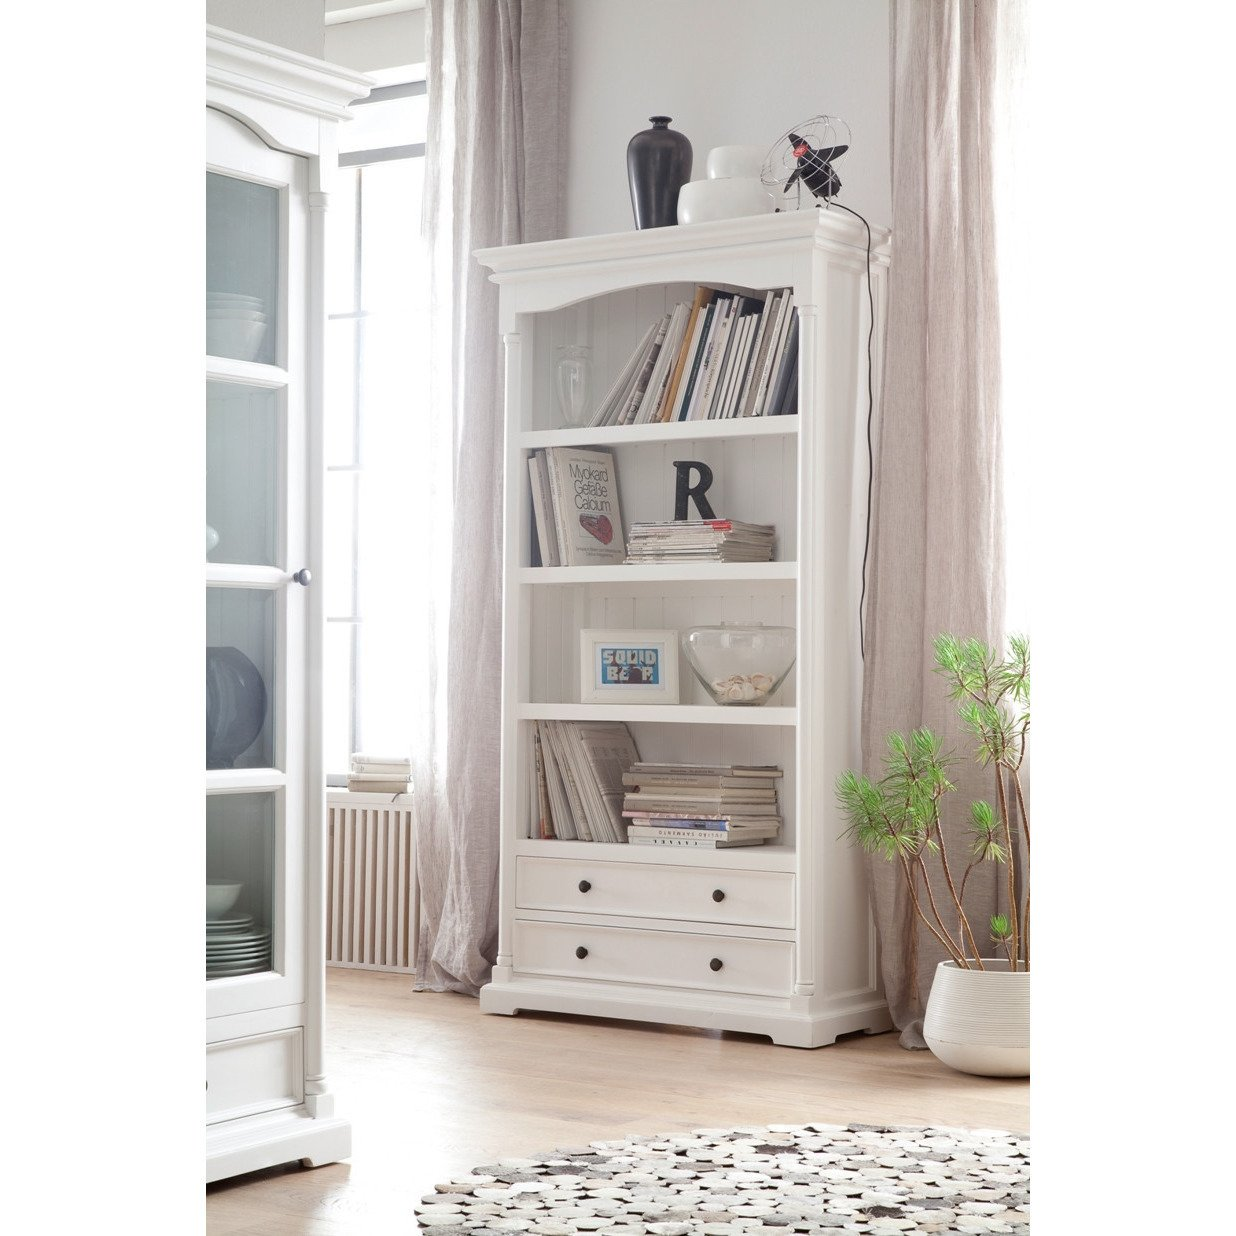 Mahogany Bookcase in White